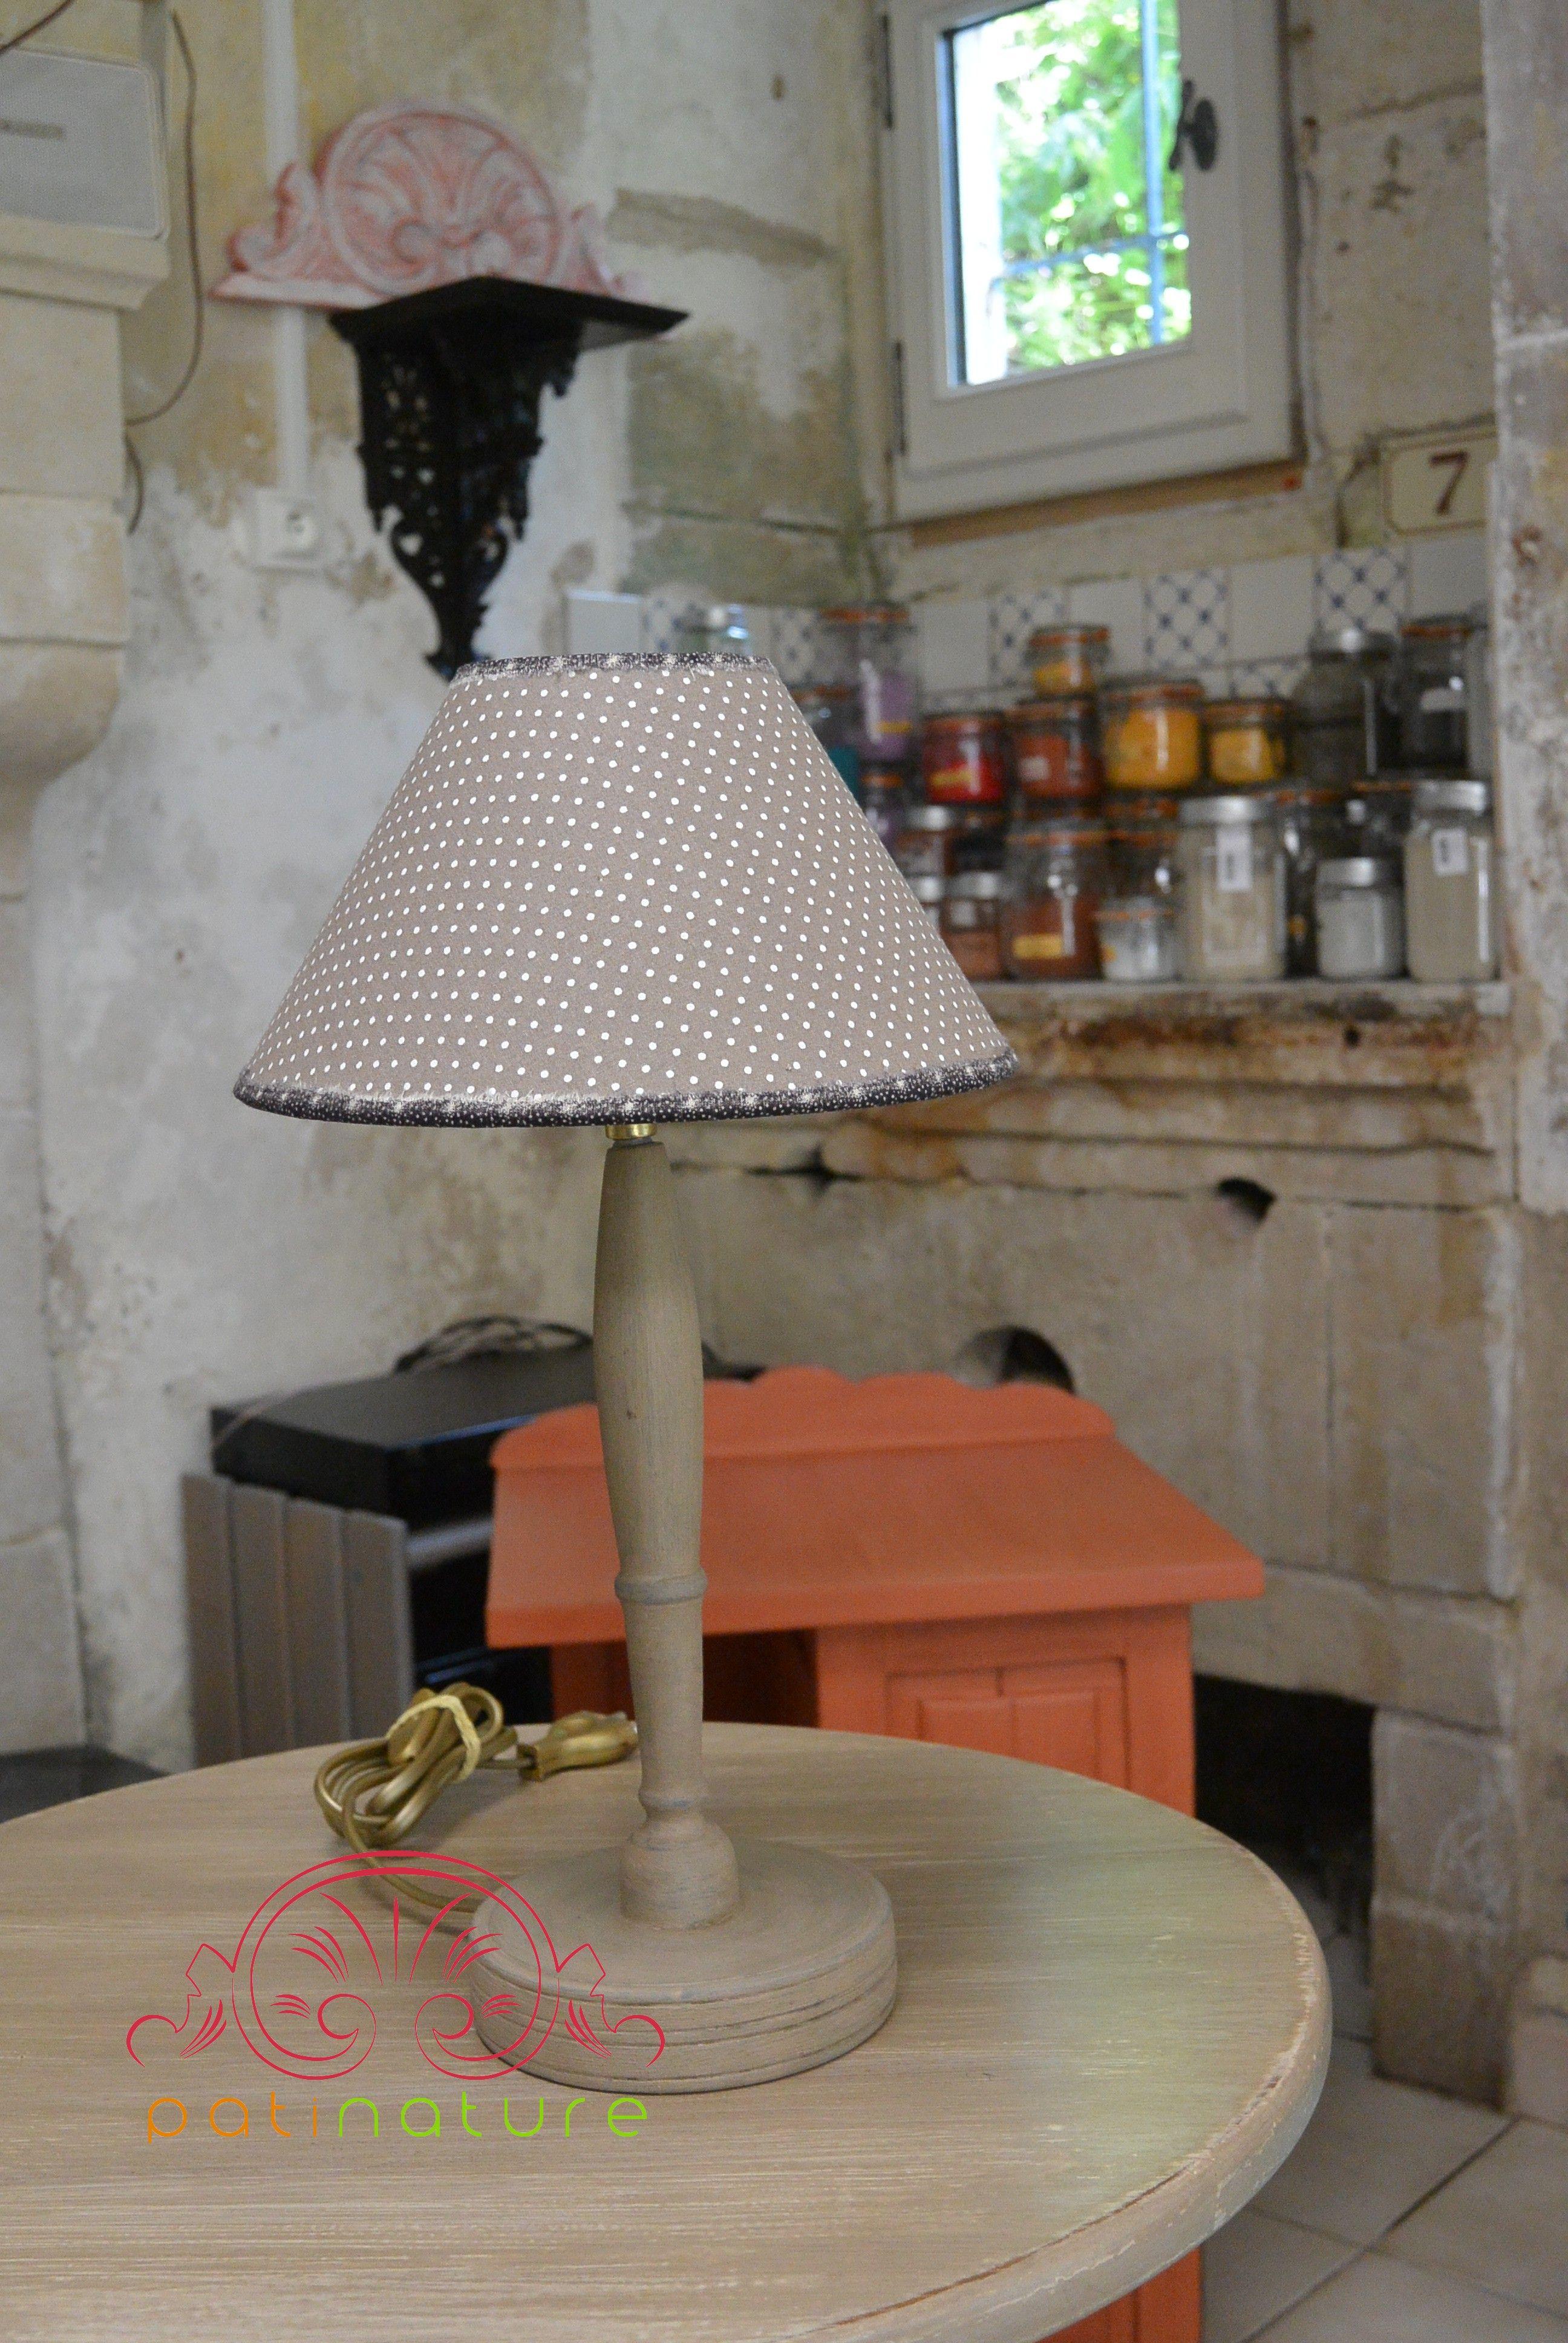 Lampe Champignon Patinature Pied Peint A La Caseine Finition A La